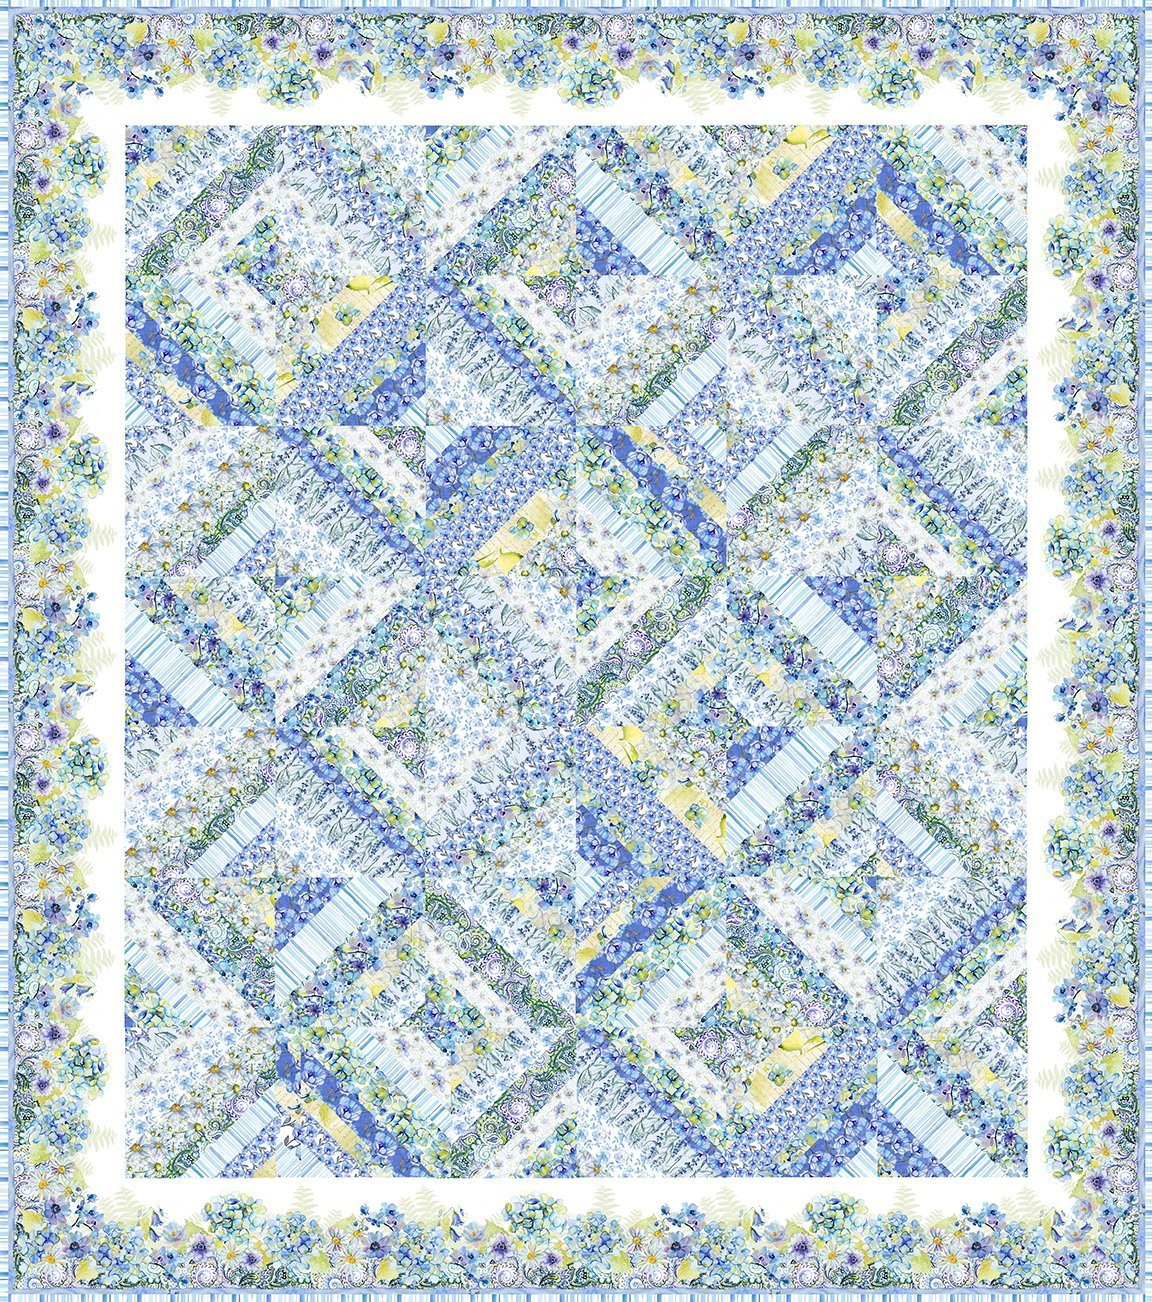 Leah Collection Quilt Kit 79-1/2 x 89-1/2